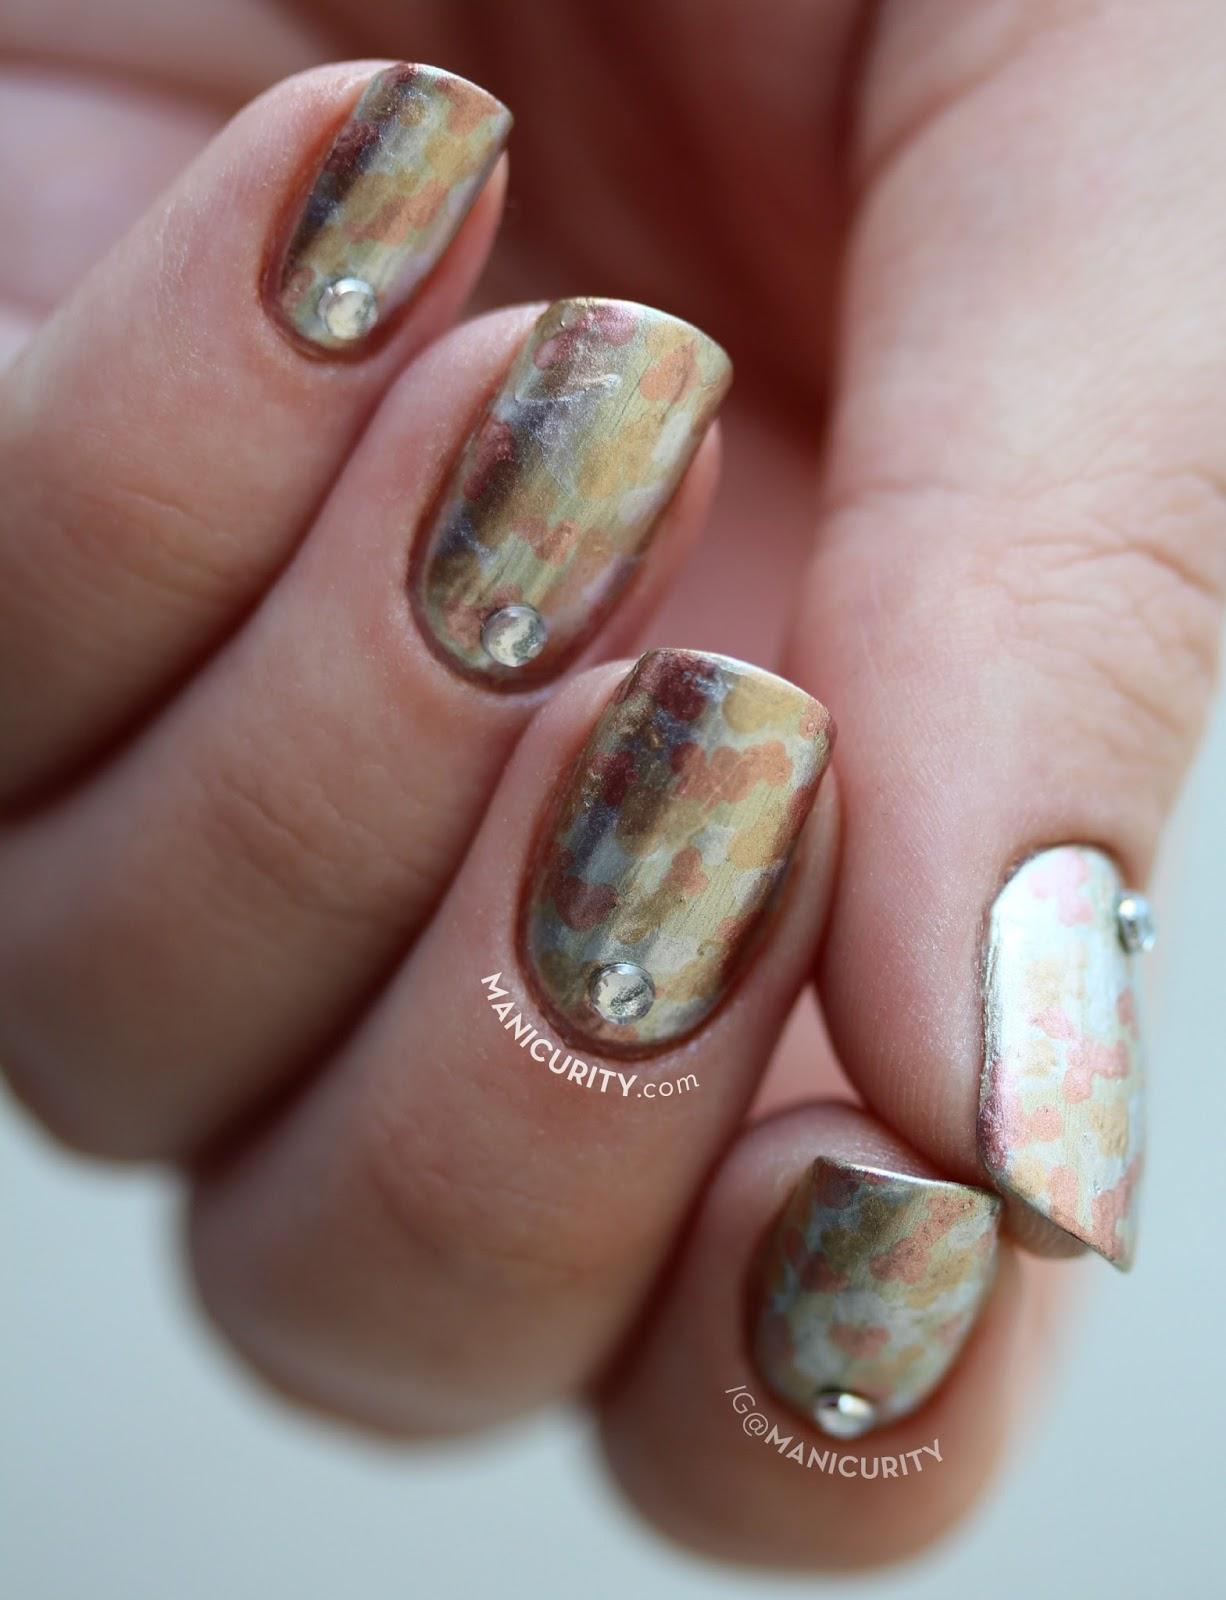 The Digit-al Dozen: Mokume-gane Nail Art - looks like chrome camo nails or metallic wood grain nails | Manicurity.com